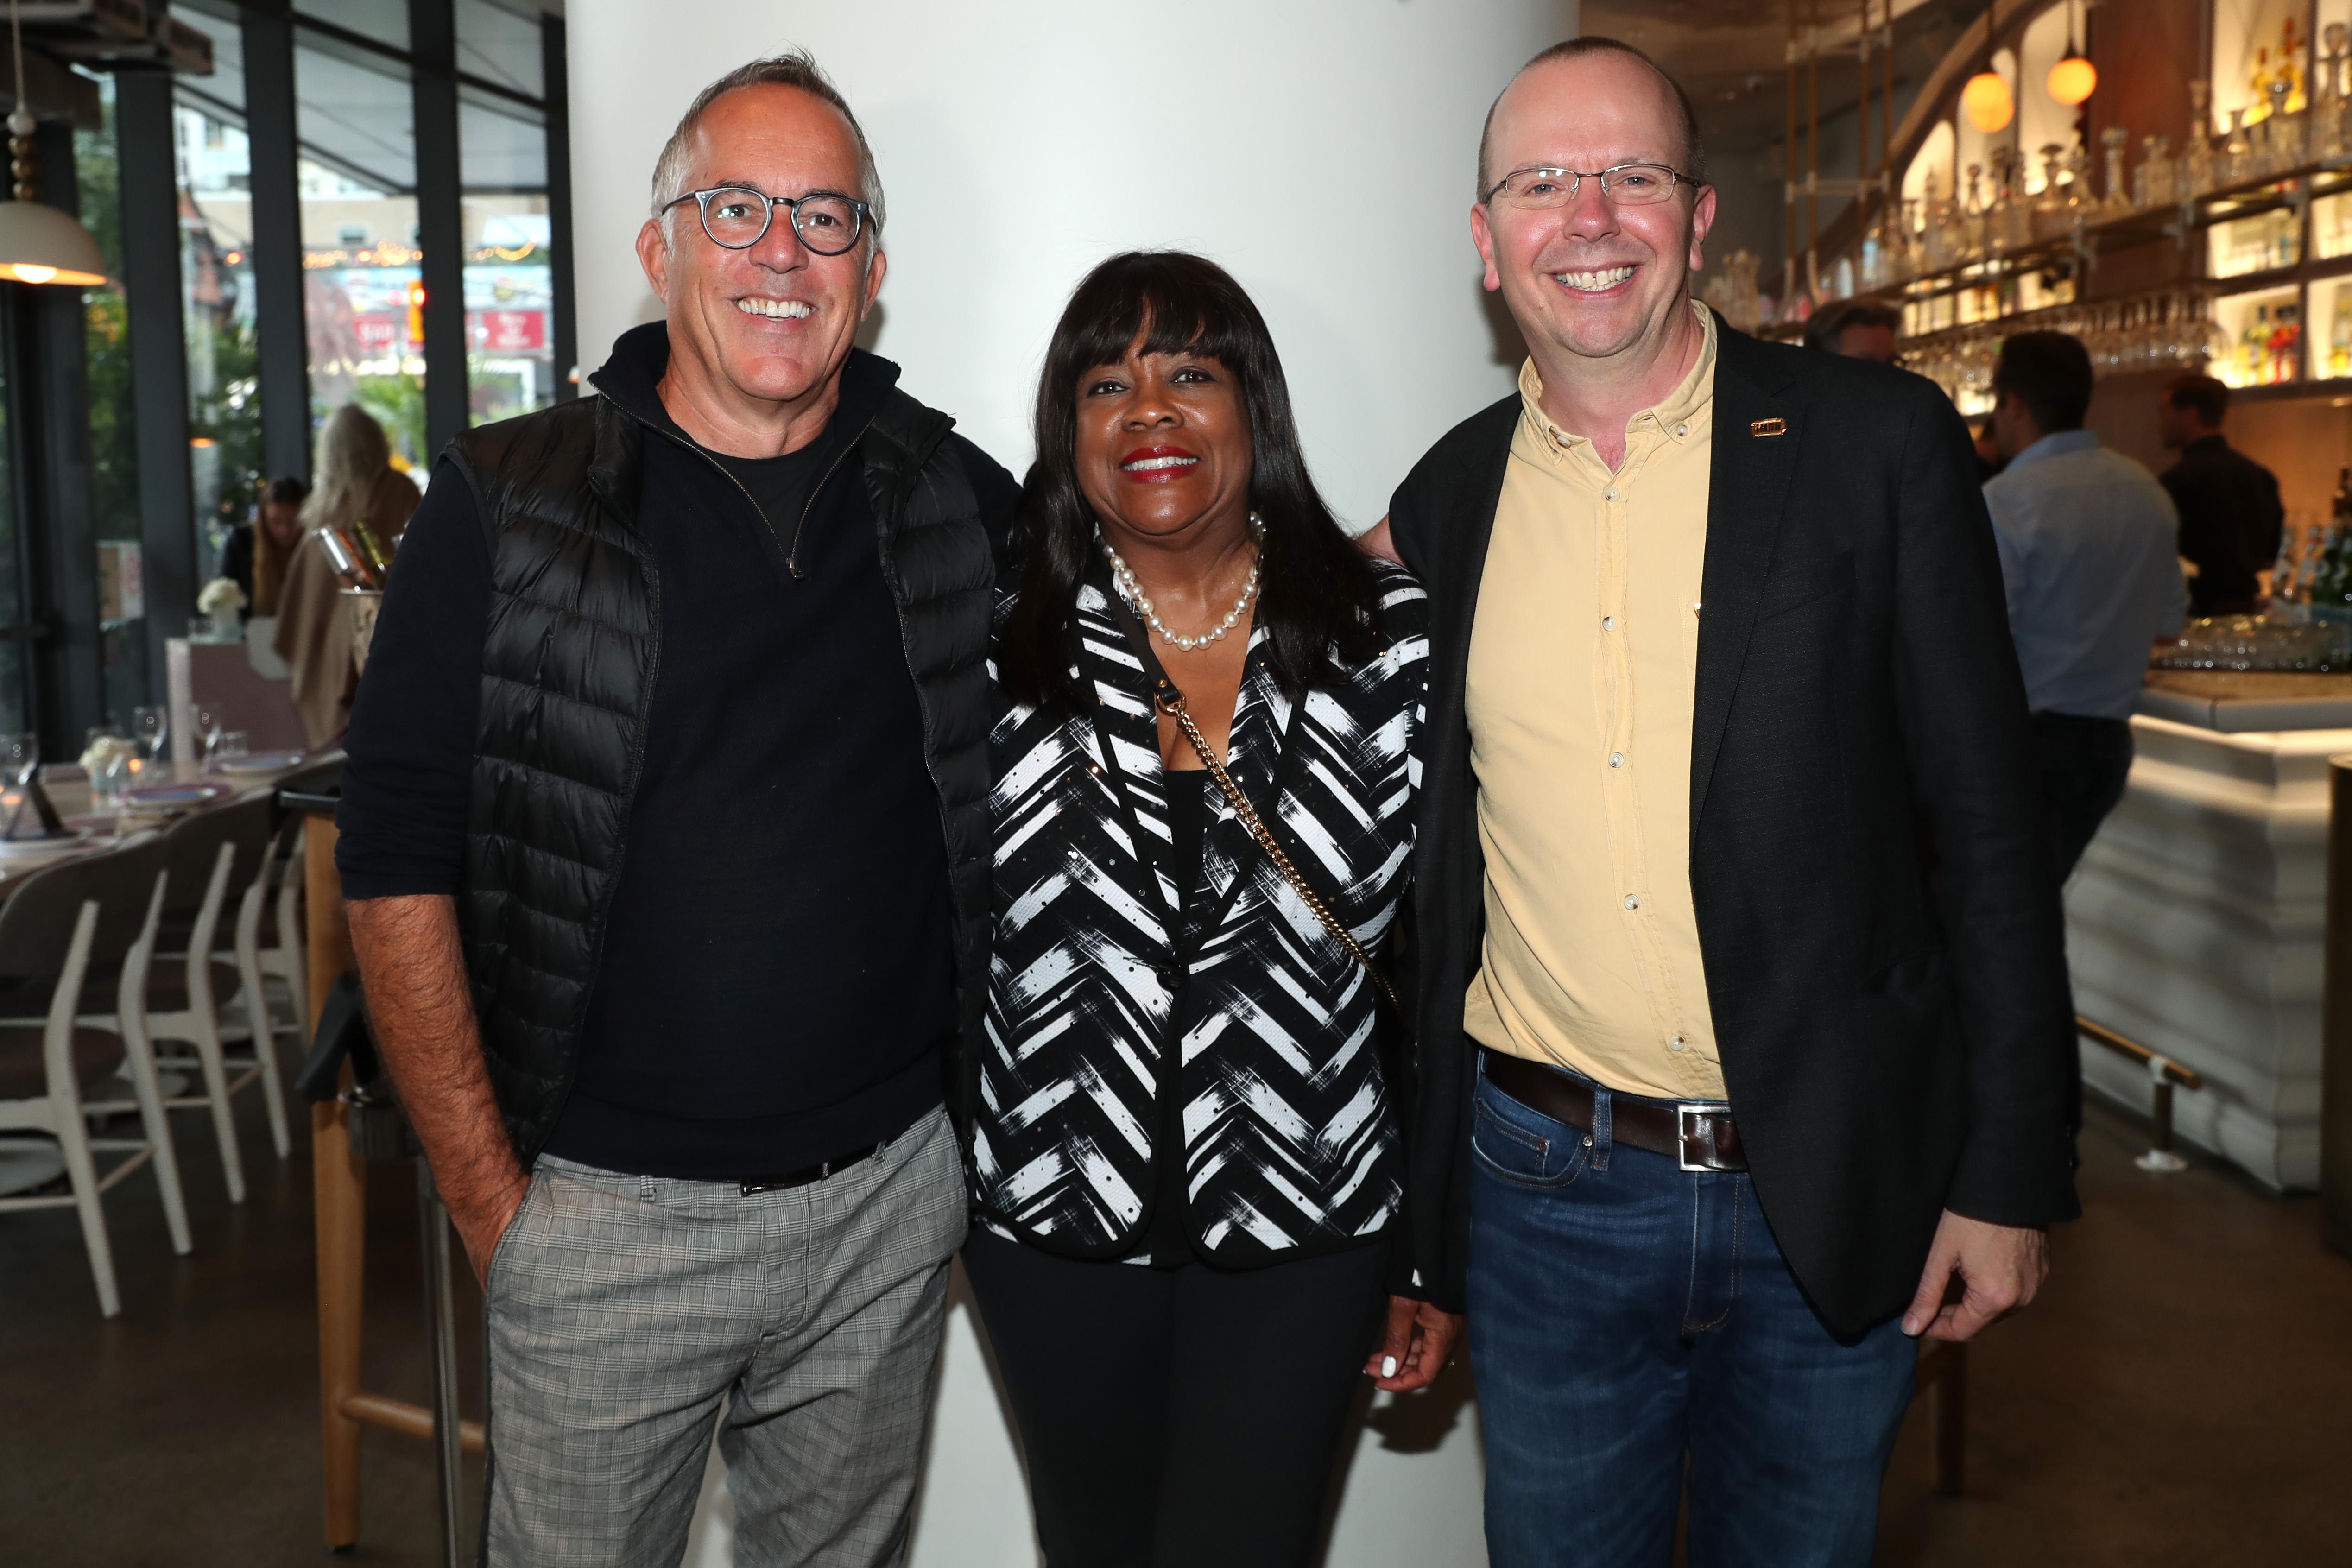 Col Needham, John Cooper, and Chaz Ebert